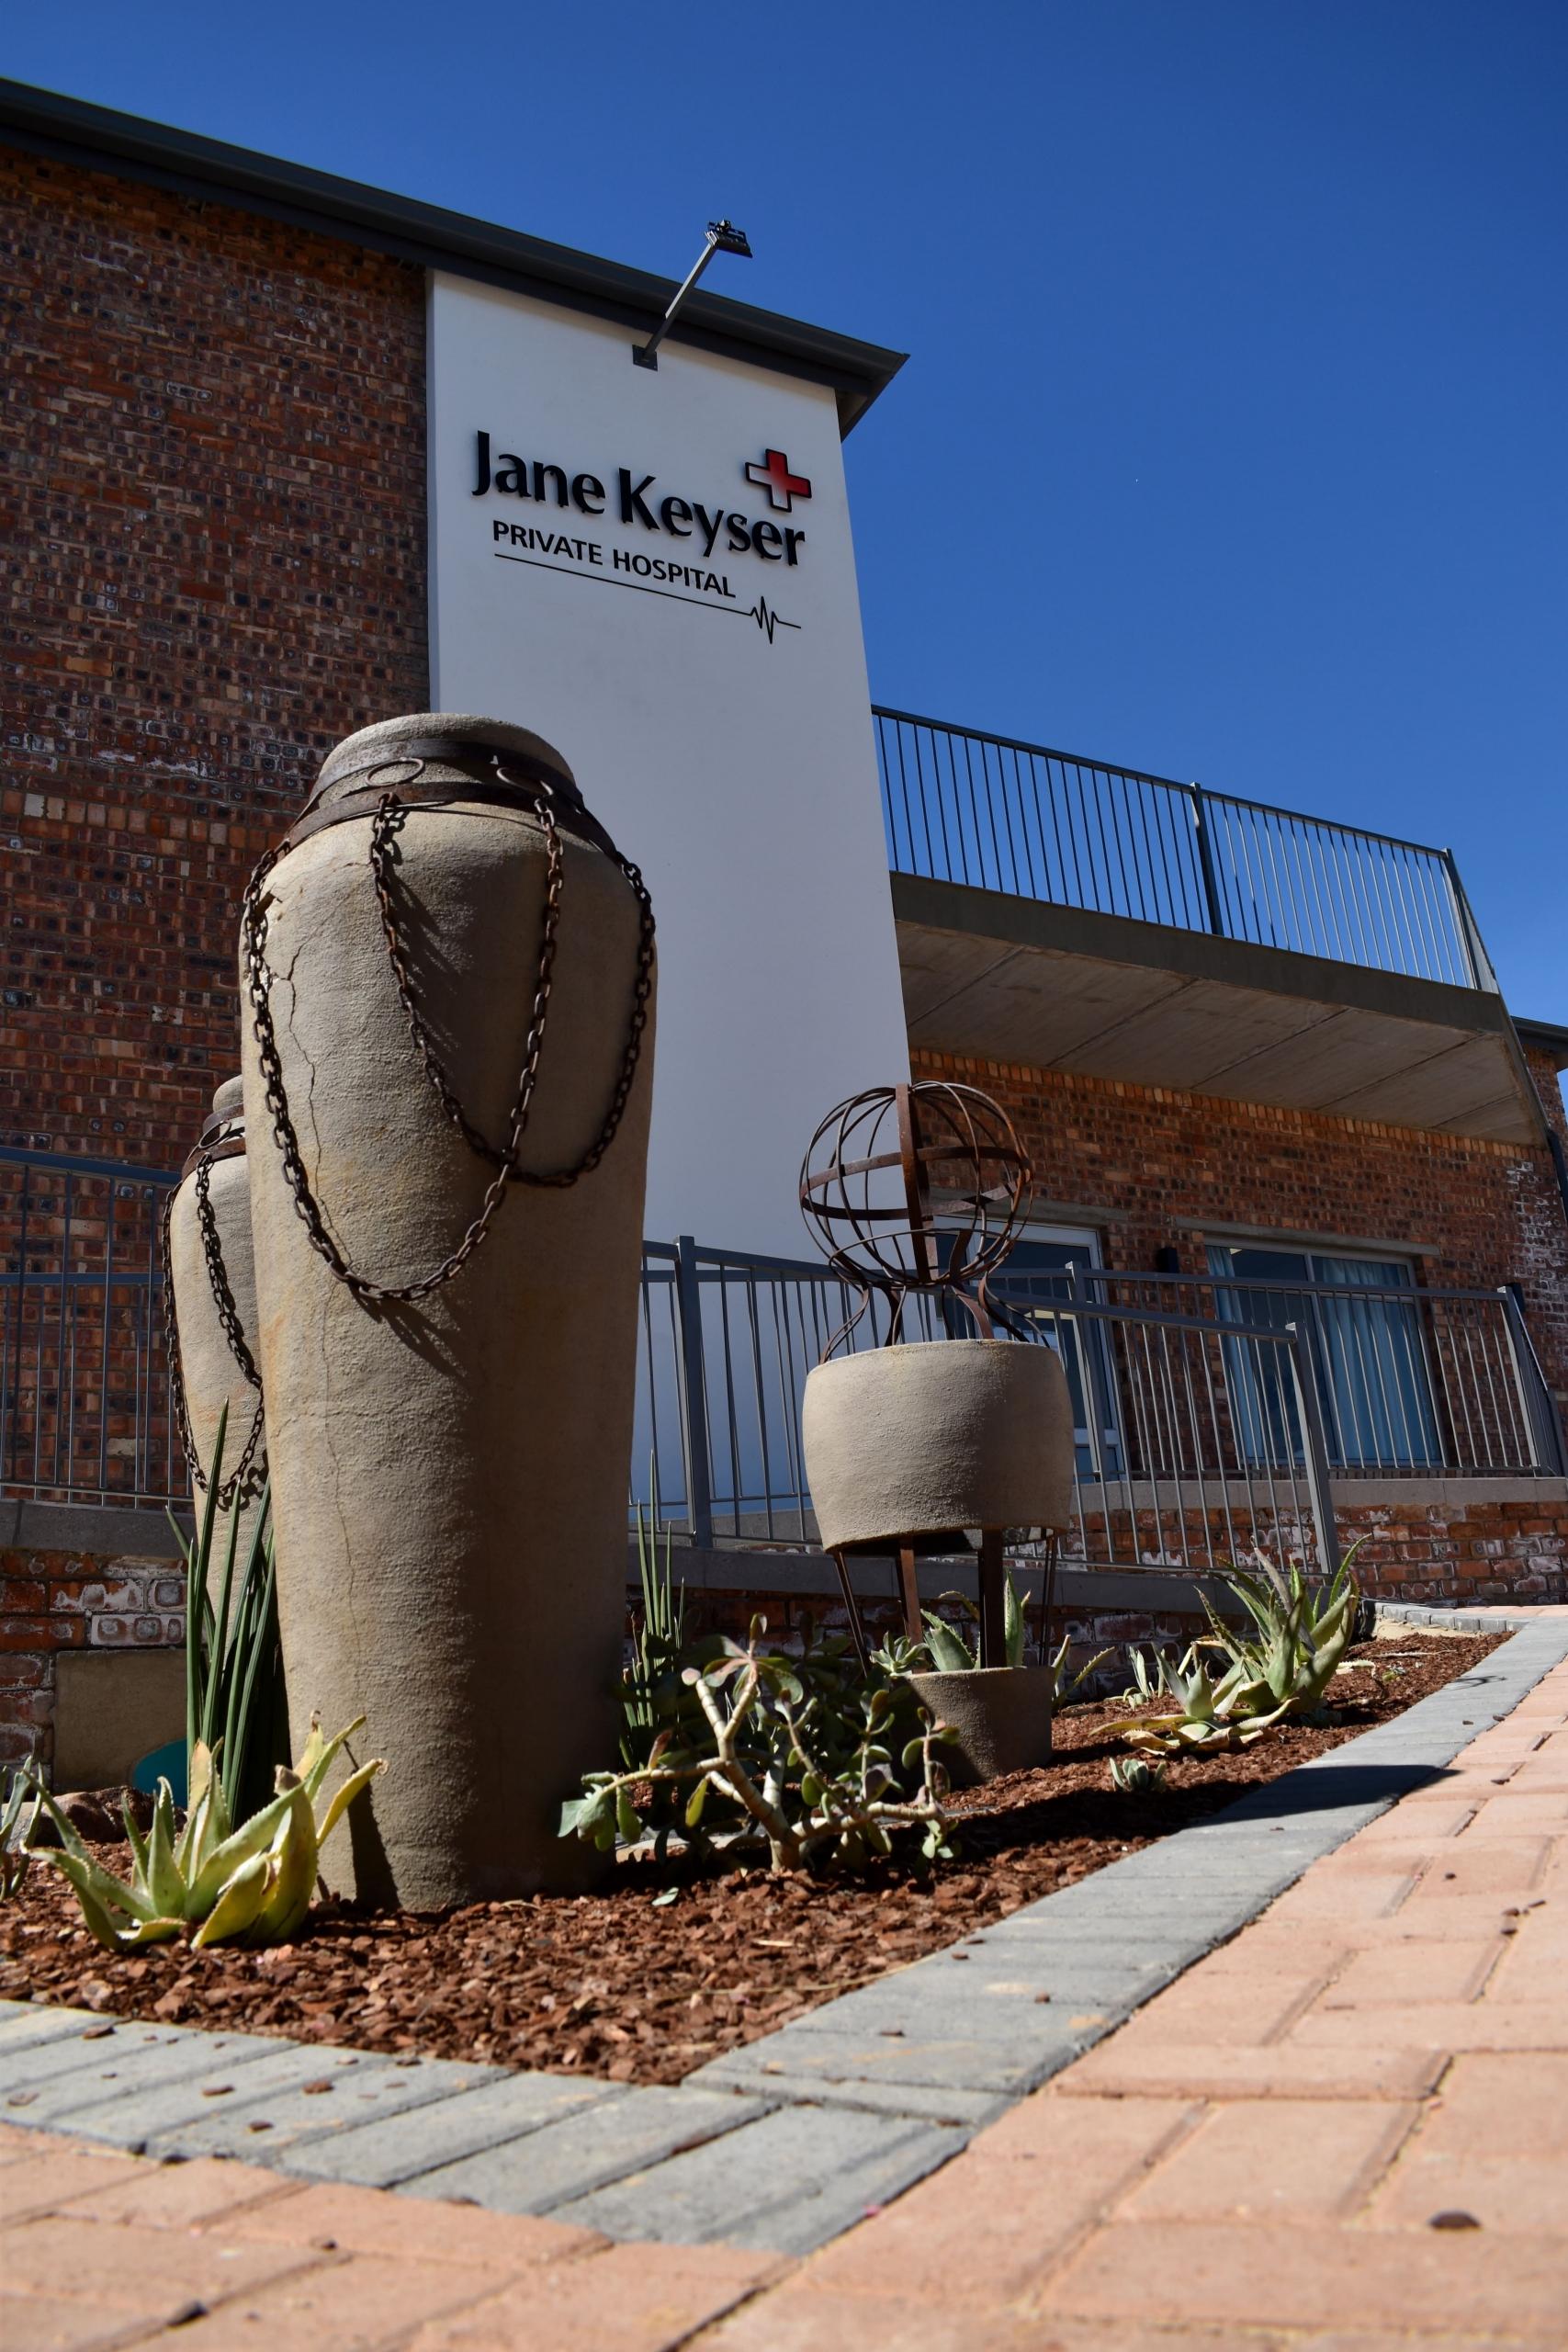 Jane Keyser Clinic - Front Entrance